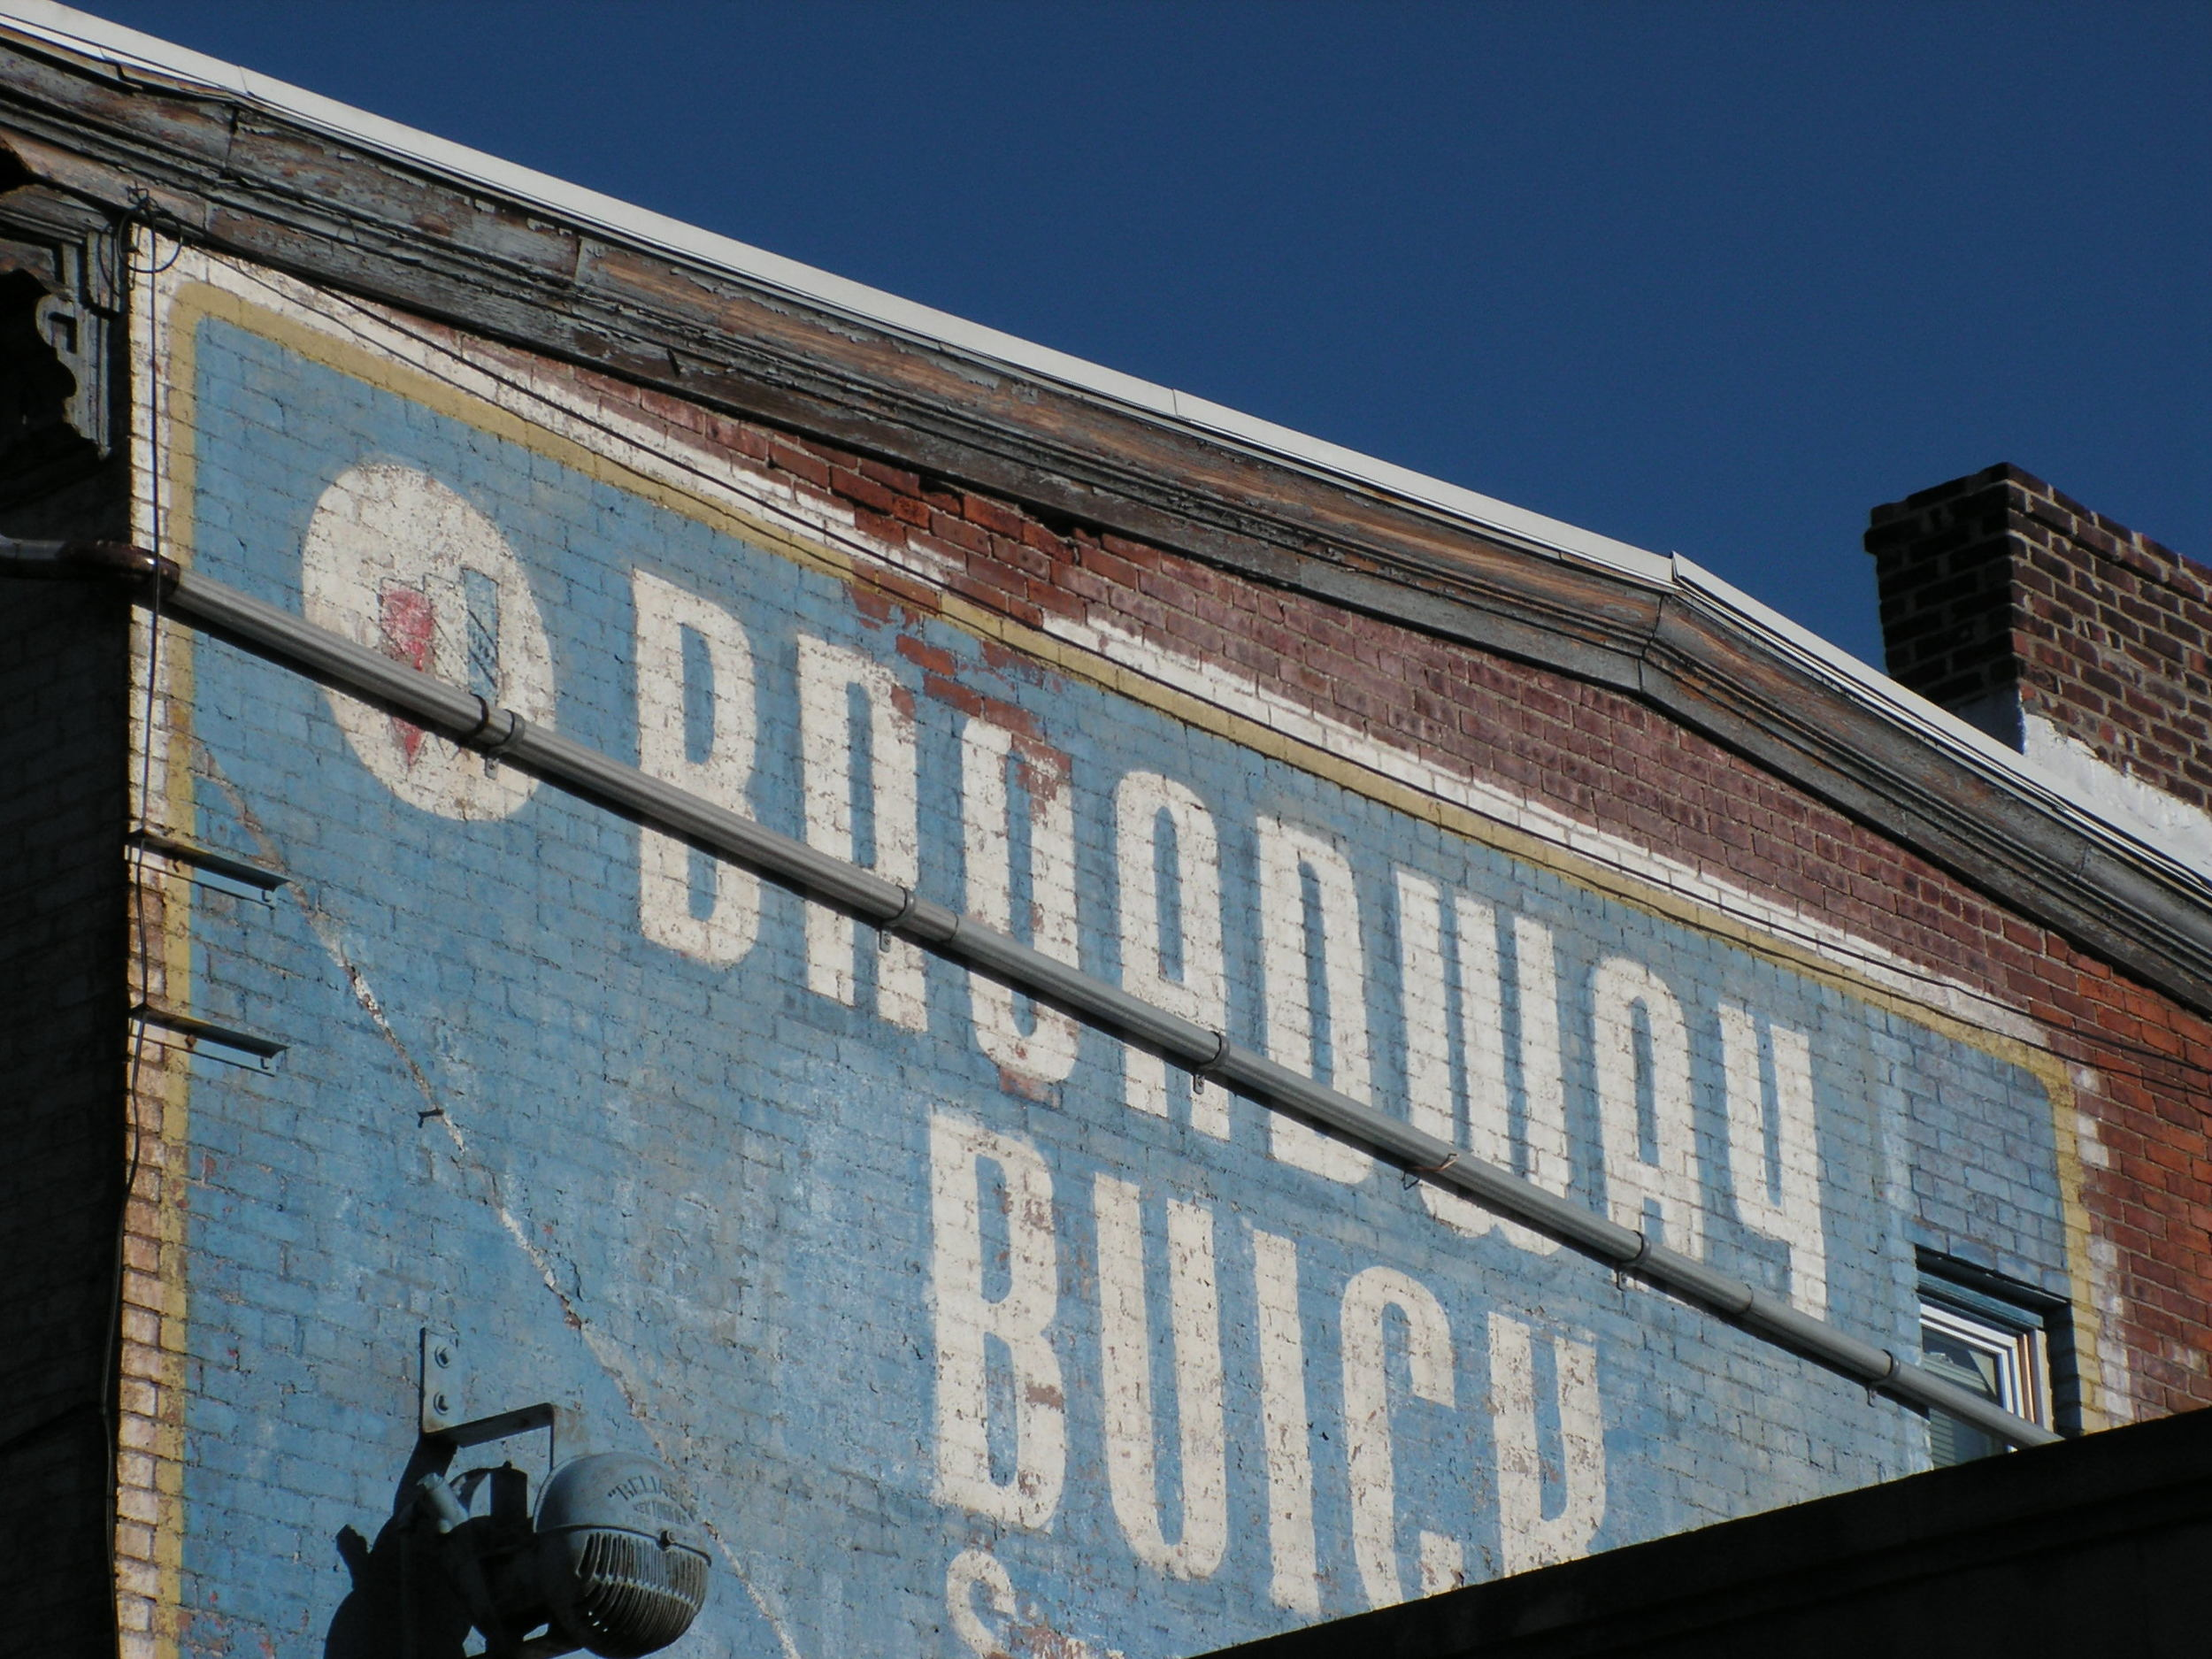 Broadway Buick, Newburgh, NY